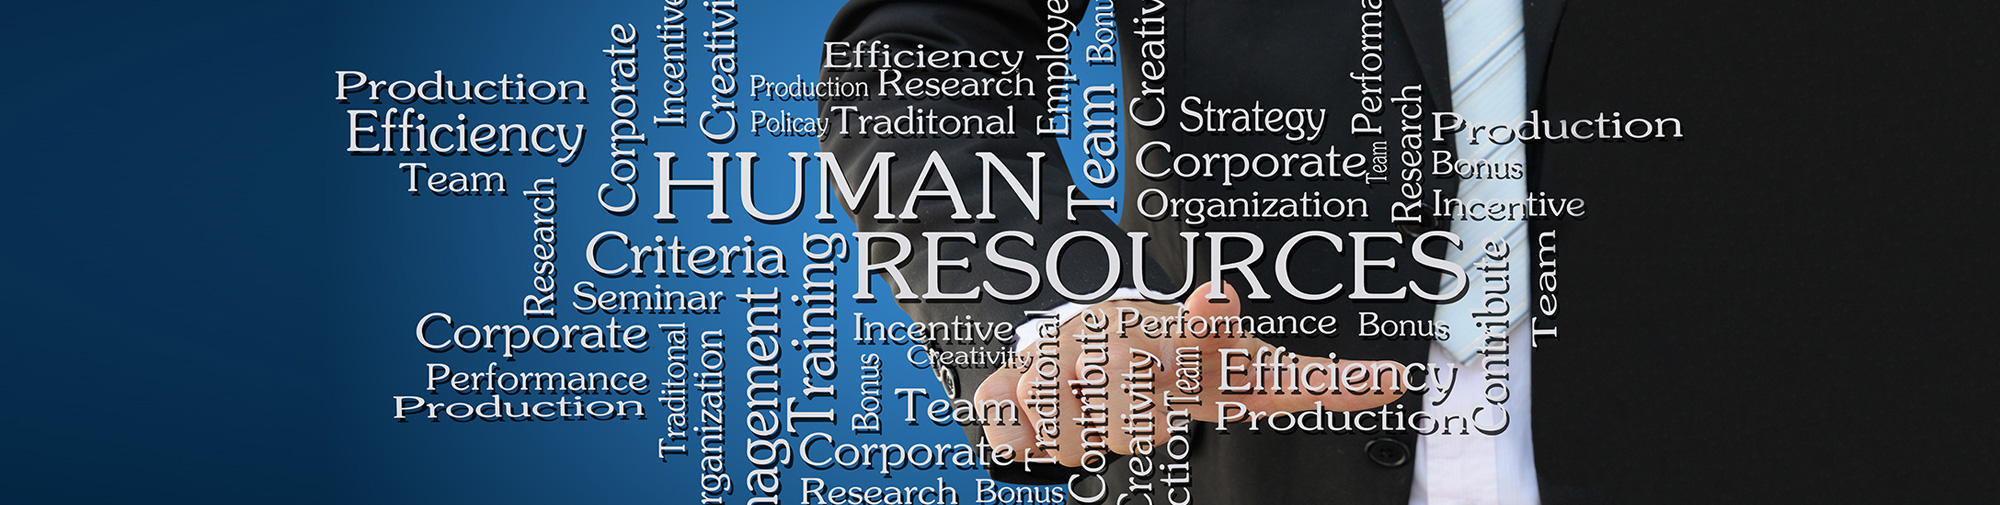 https://www.gekterna.com/userfiles/11e3ebfa-92f9-4083-8c5b-a26d00fe9b3c/Human_Resources_1.jpg